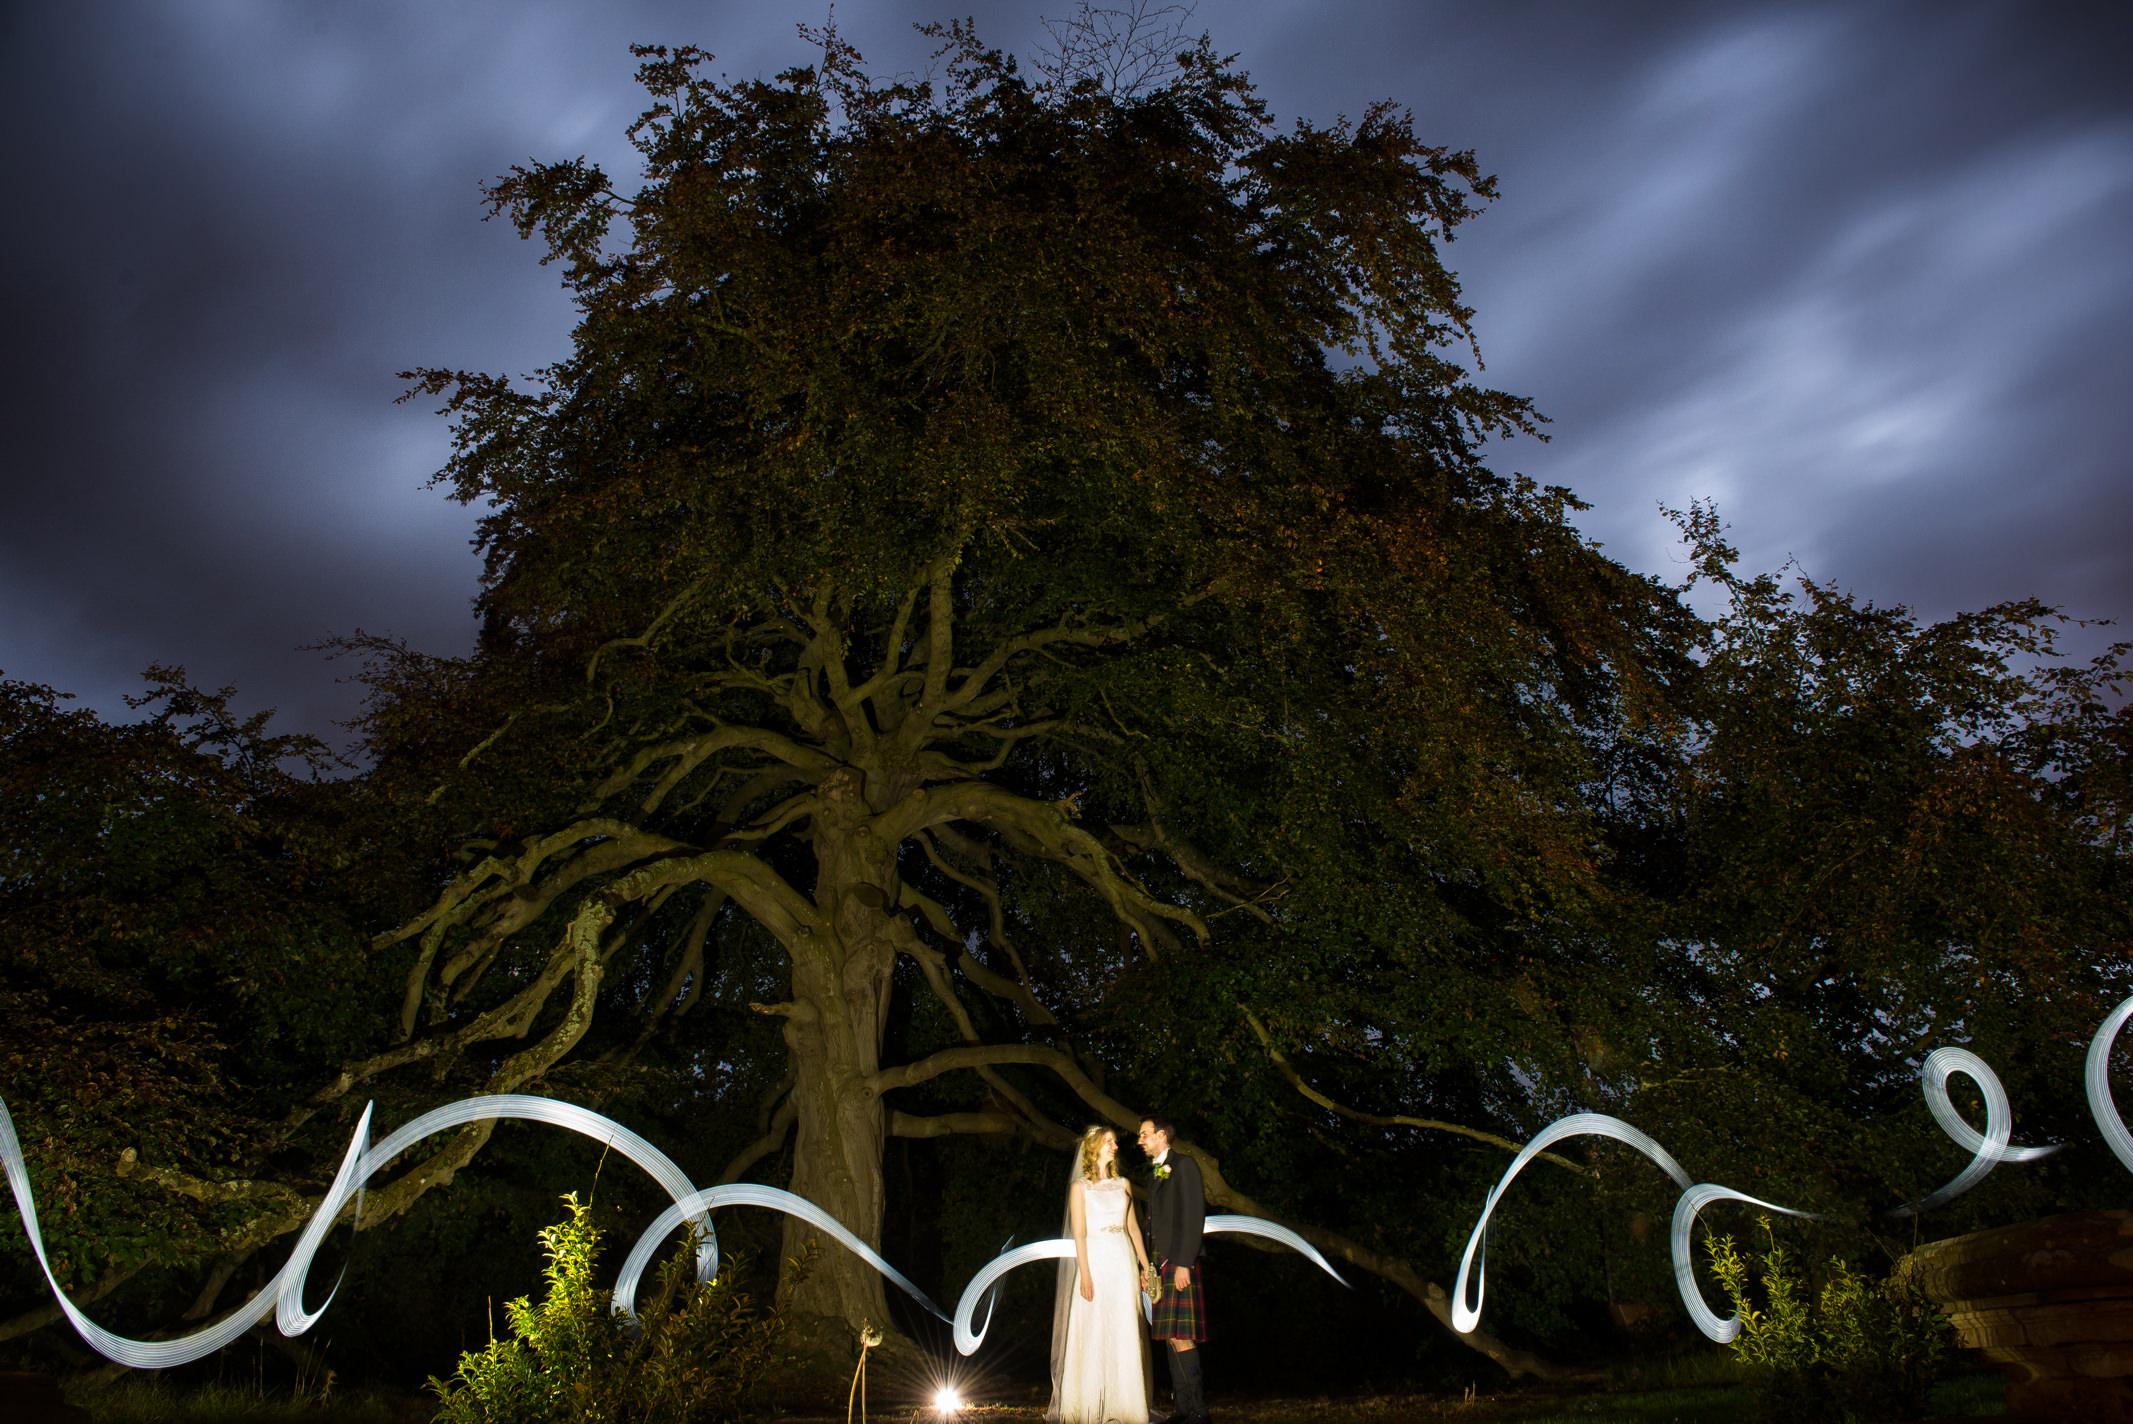 castle-wedding-venues-near-edinburgh-(5).jpg